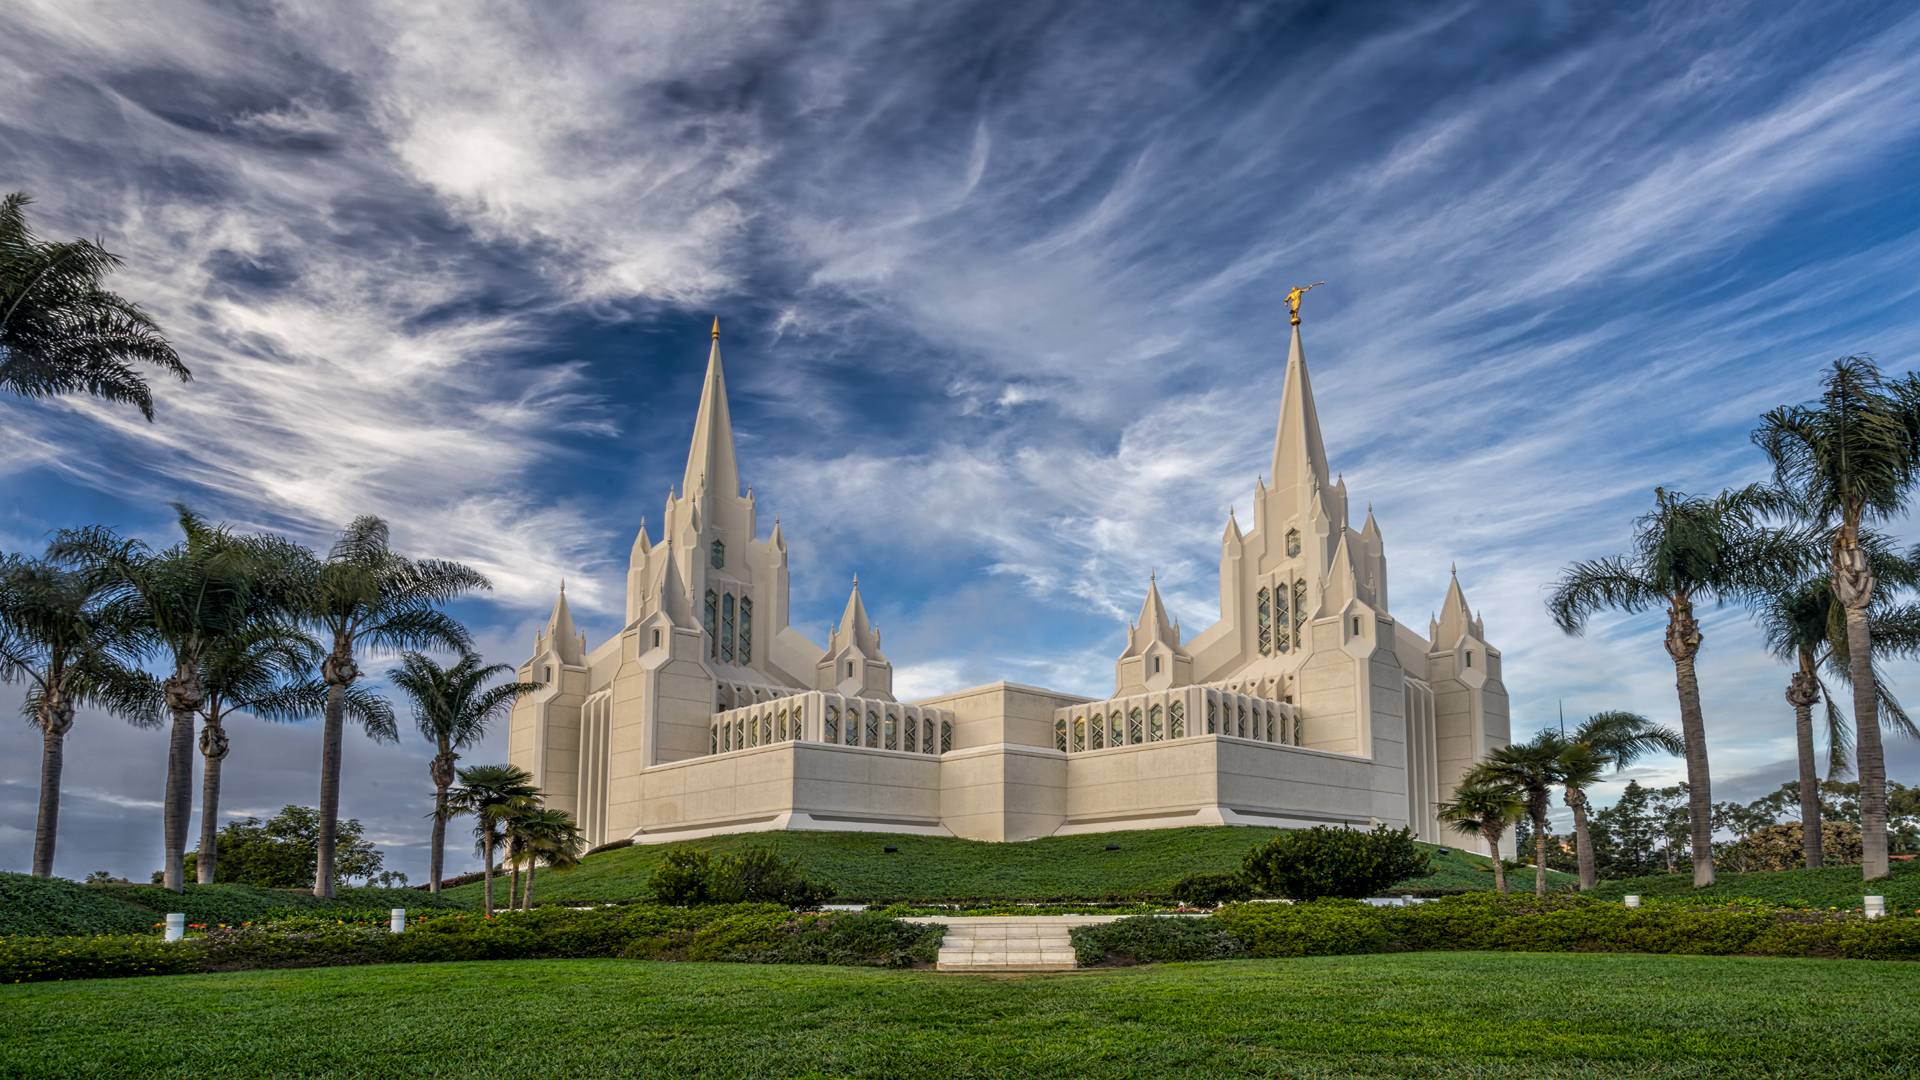 Mormon Temple1, San Diego